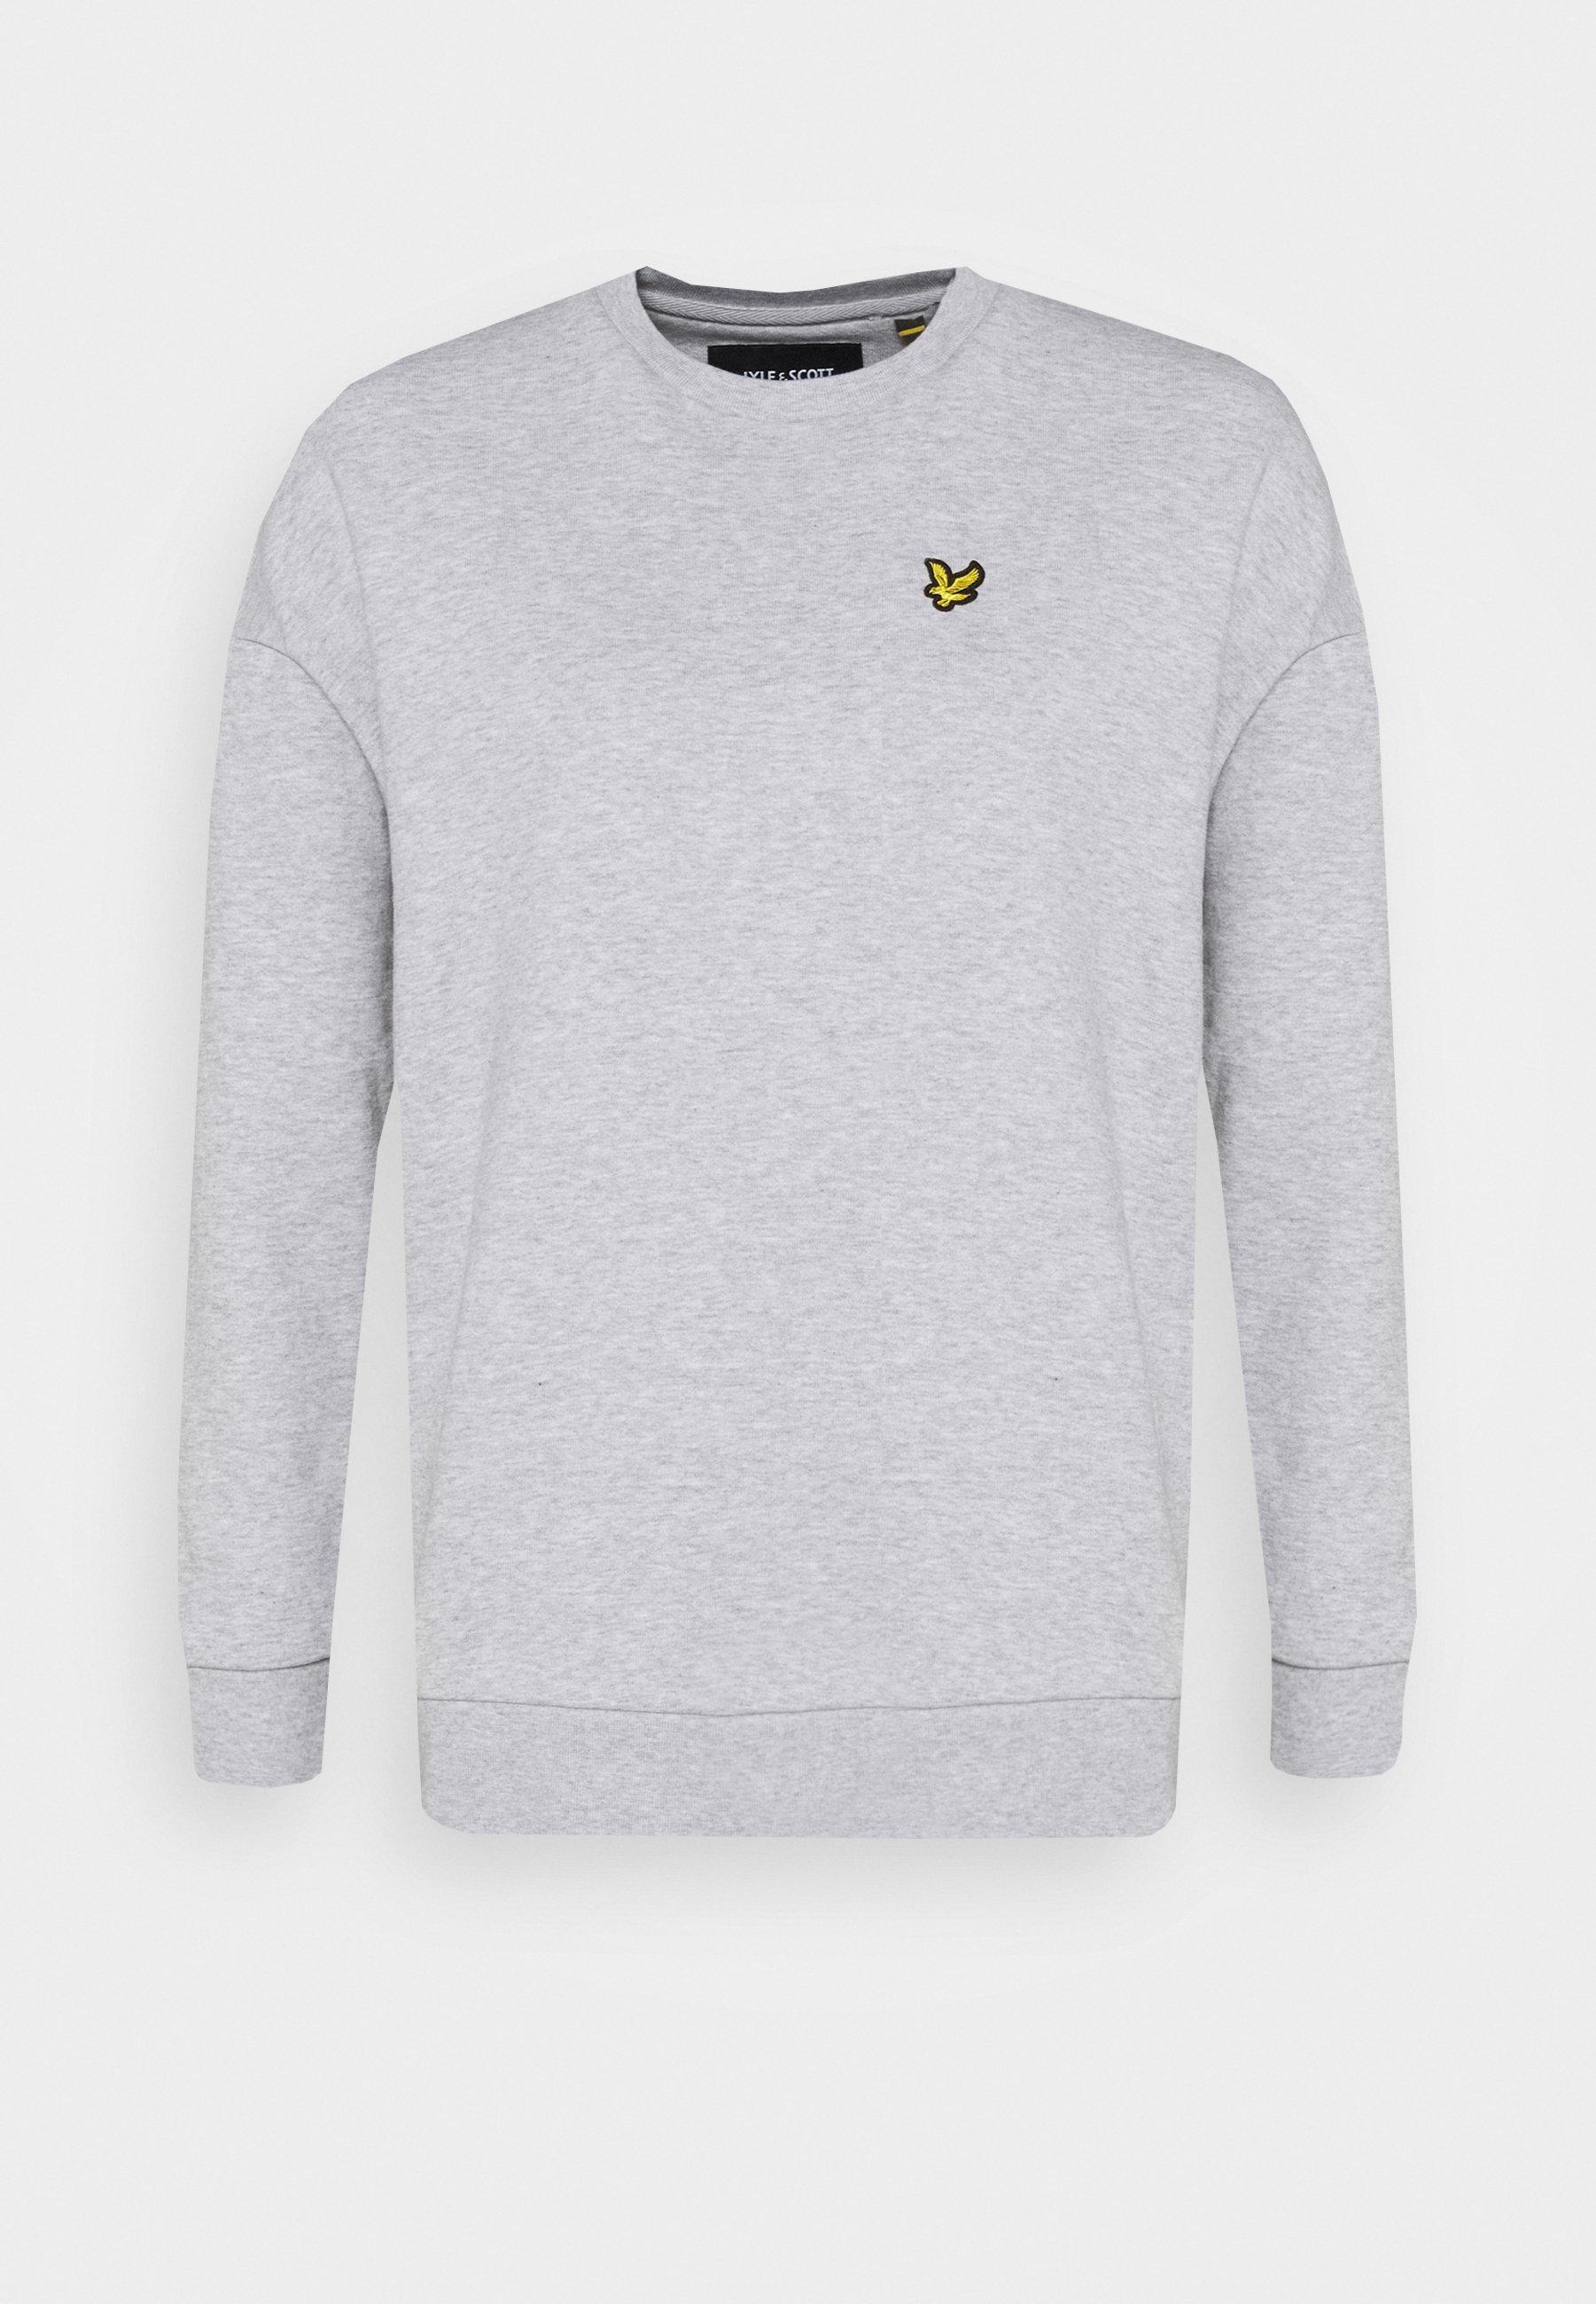 Lyle & Scott Sweatshirt - Light Grey